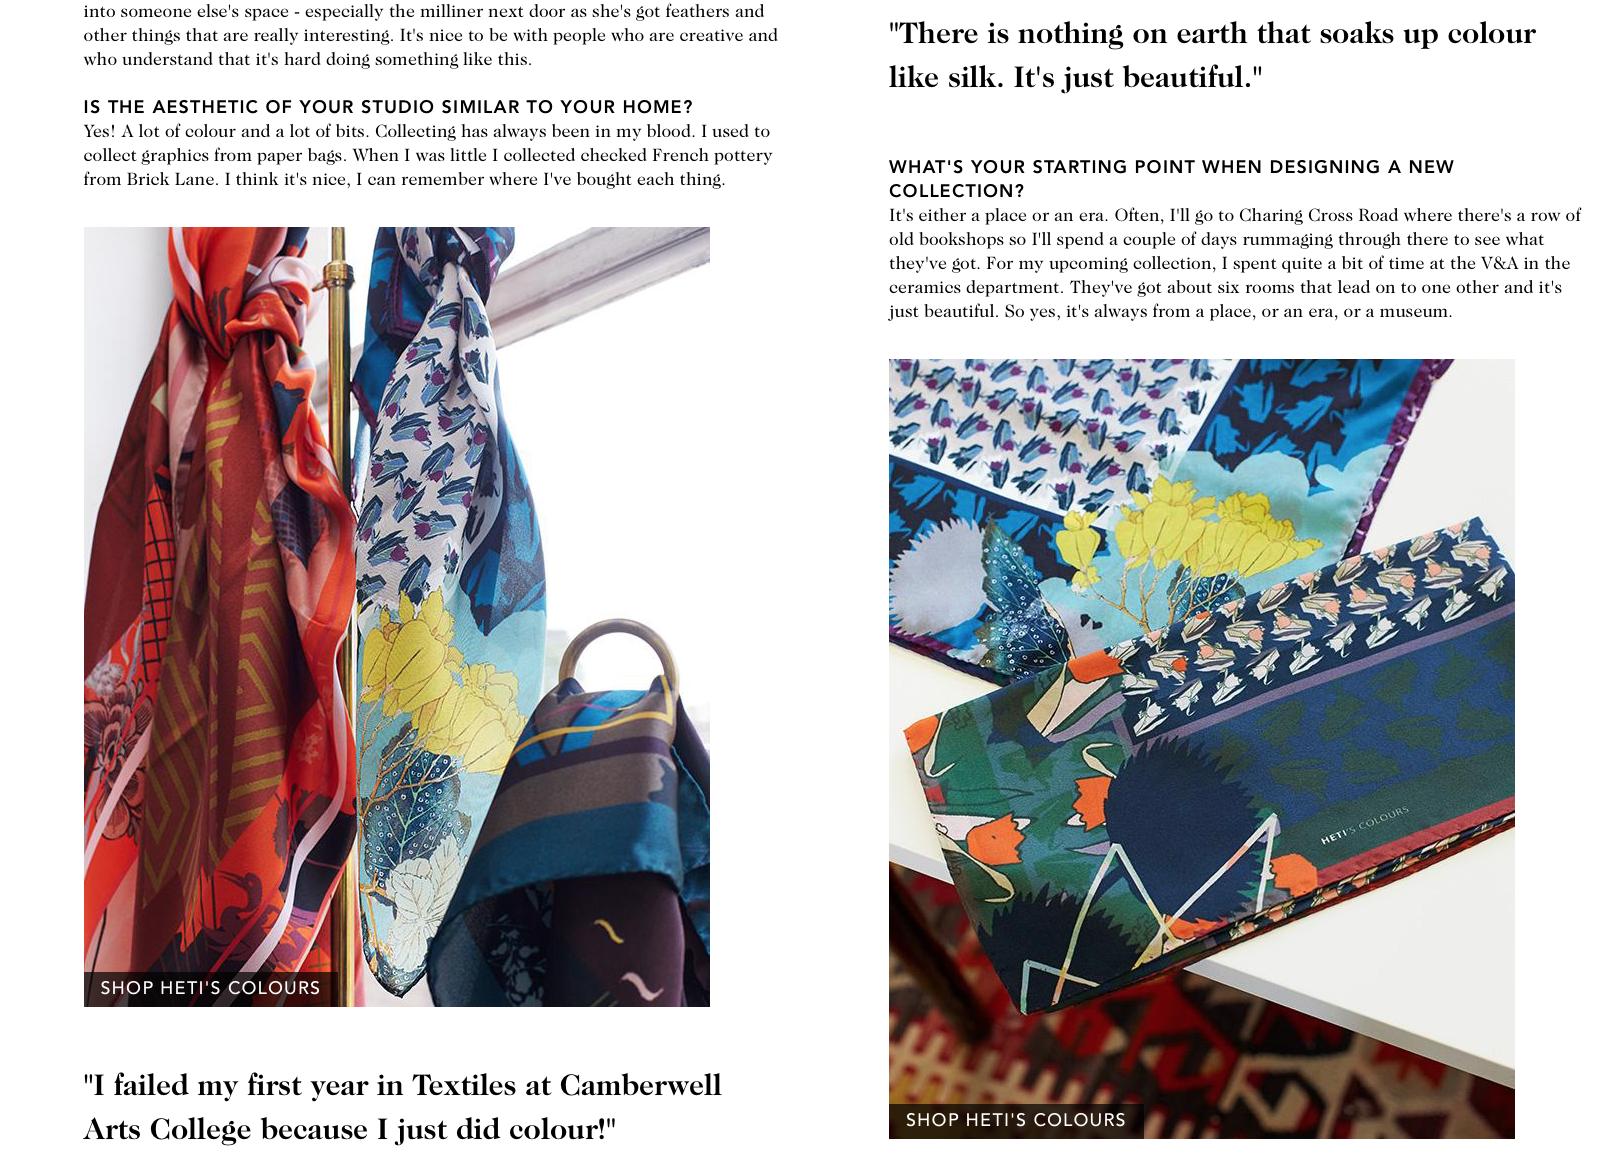 Liberty London Heti's Colours Luxury Scarf Company Designer London